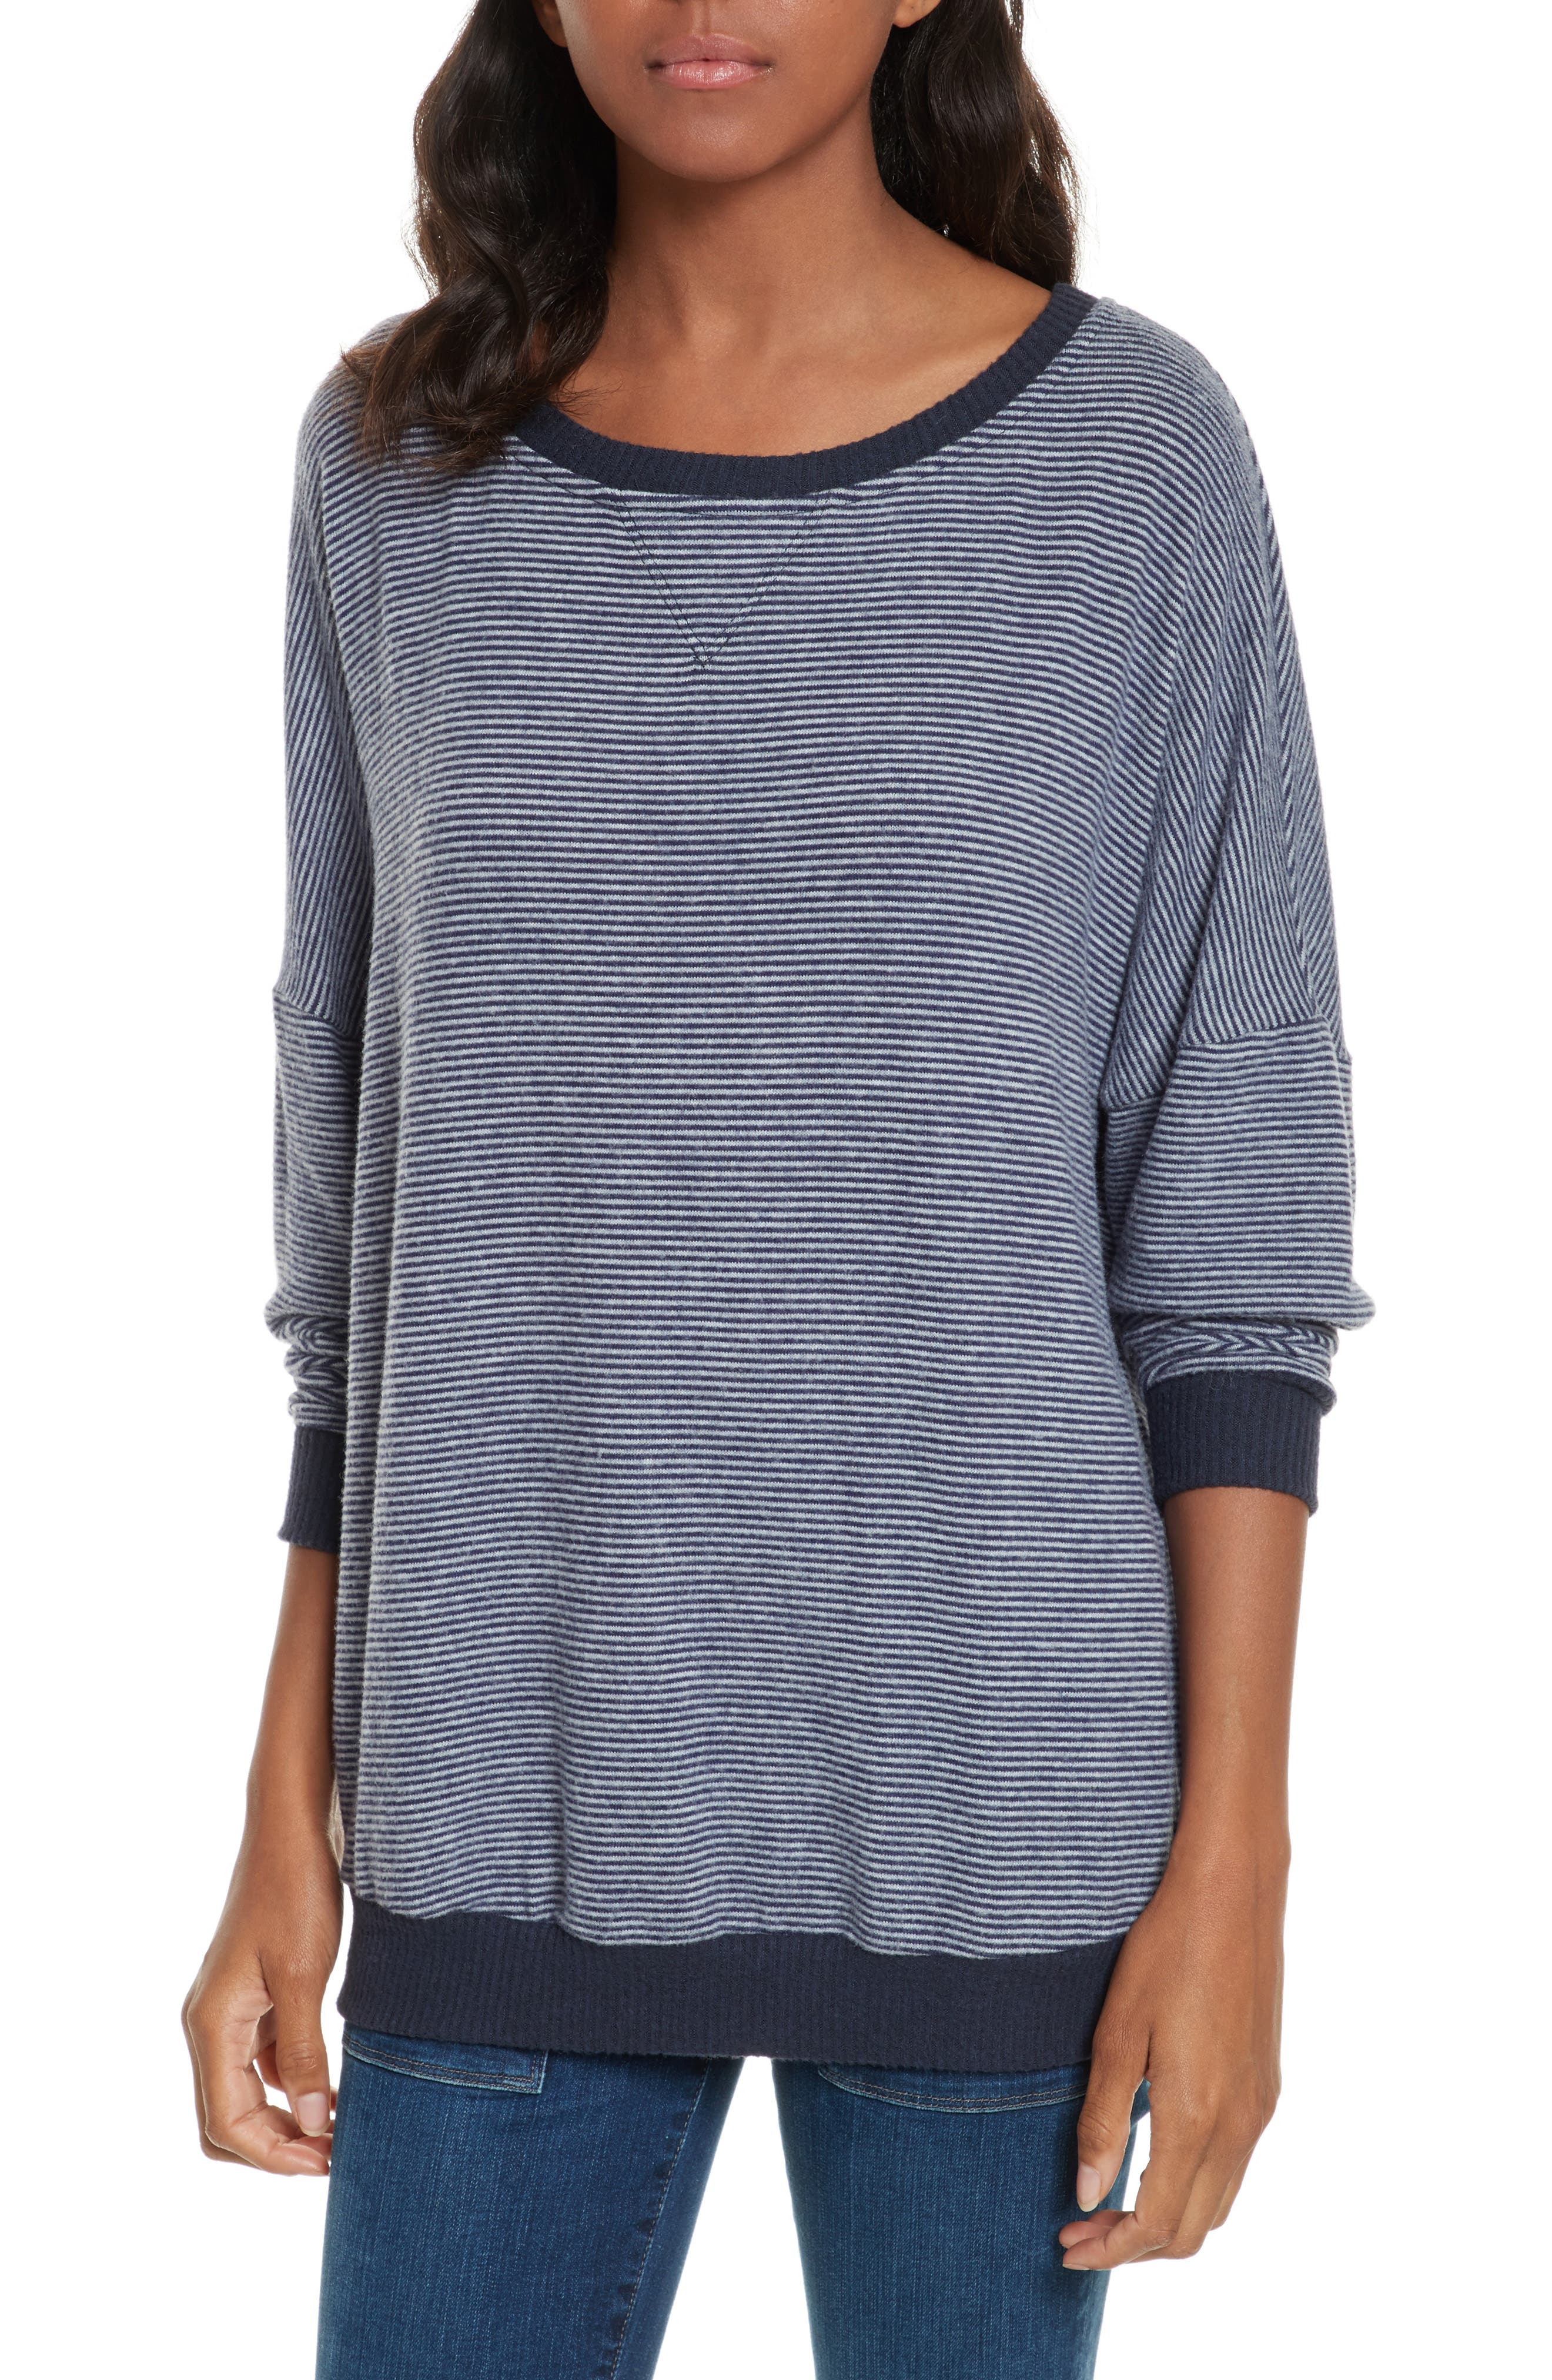 Alternate Image 1 Selected - Joie Striped Sweatshirt